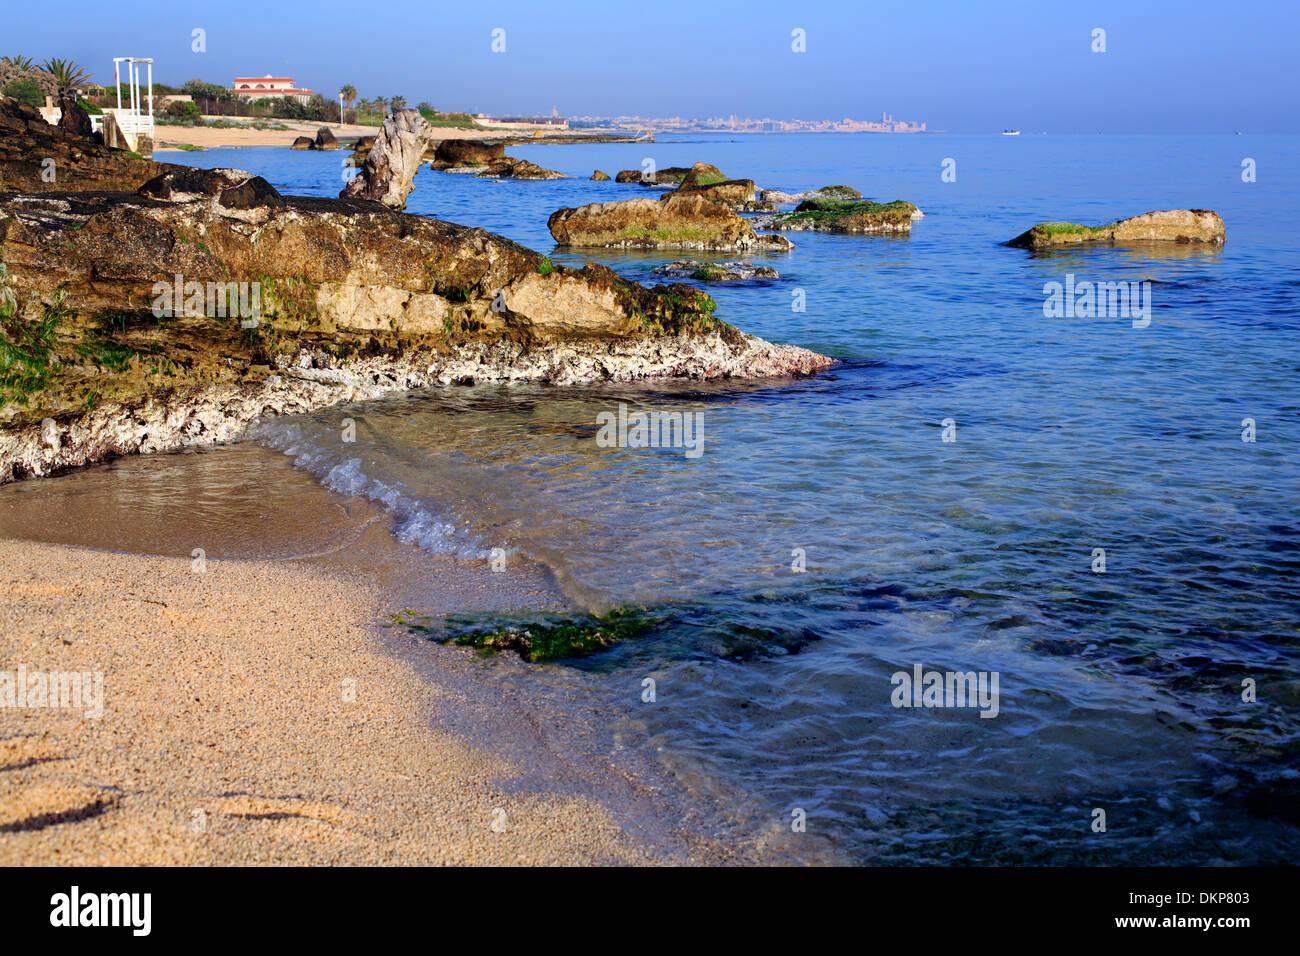 Adriatic coast near Bari, Apulia, Italy - Stock Image